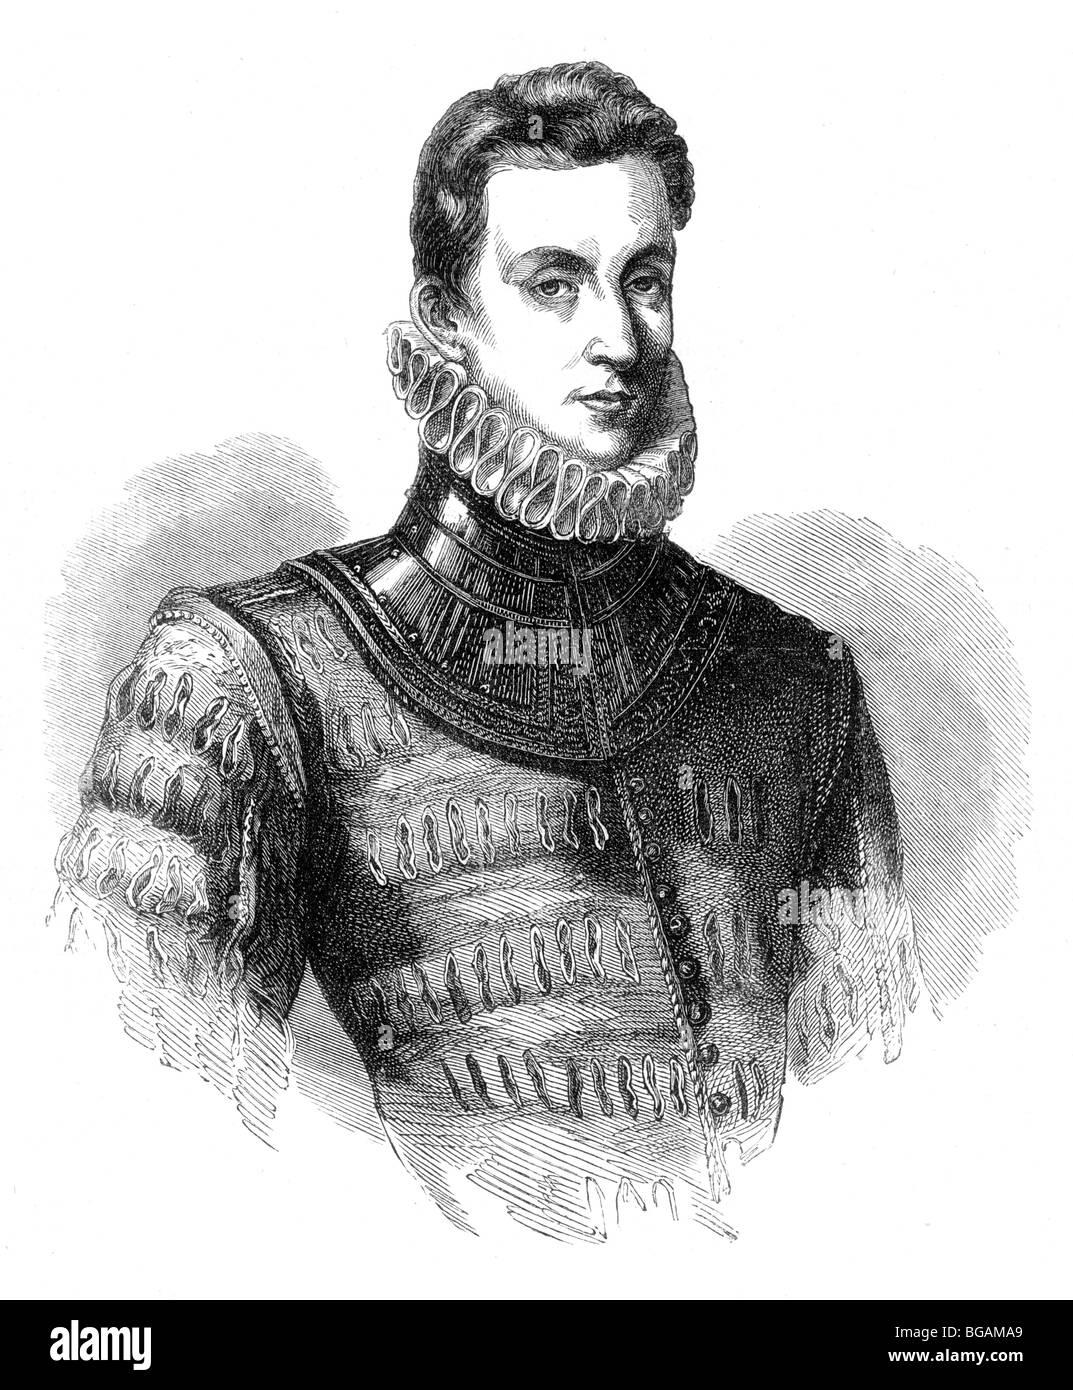 Illustration; Portrait of Sir Philip Sidney, English Poet, b 1554 d 1586 - Stock Image